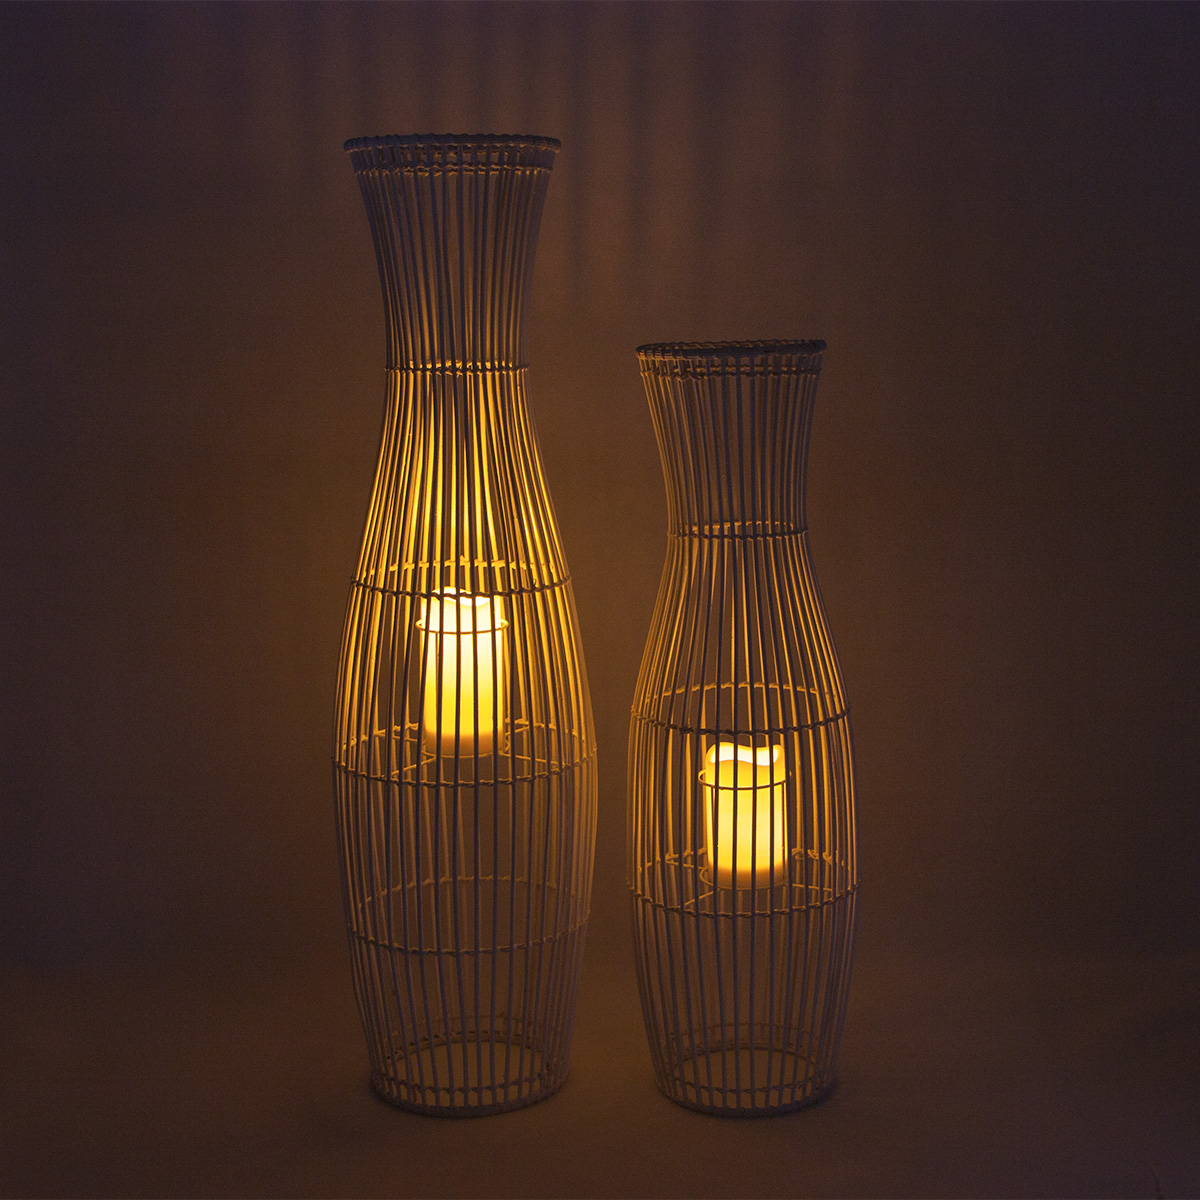 Decorative Solar Lantern Rattan Waterproof for Table Decor Featured Image